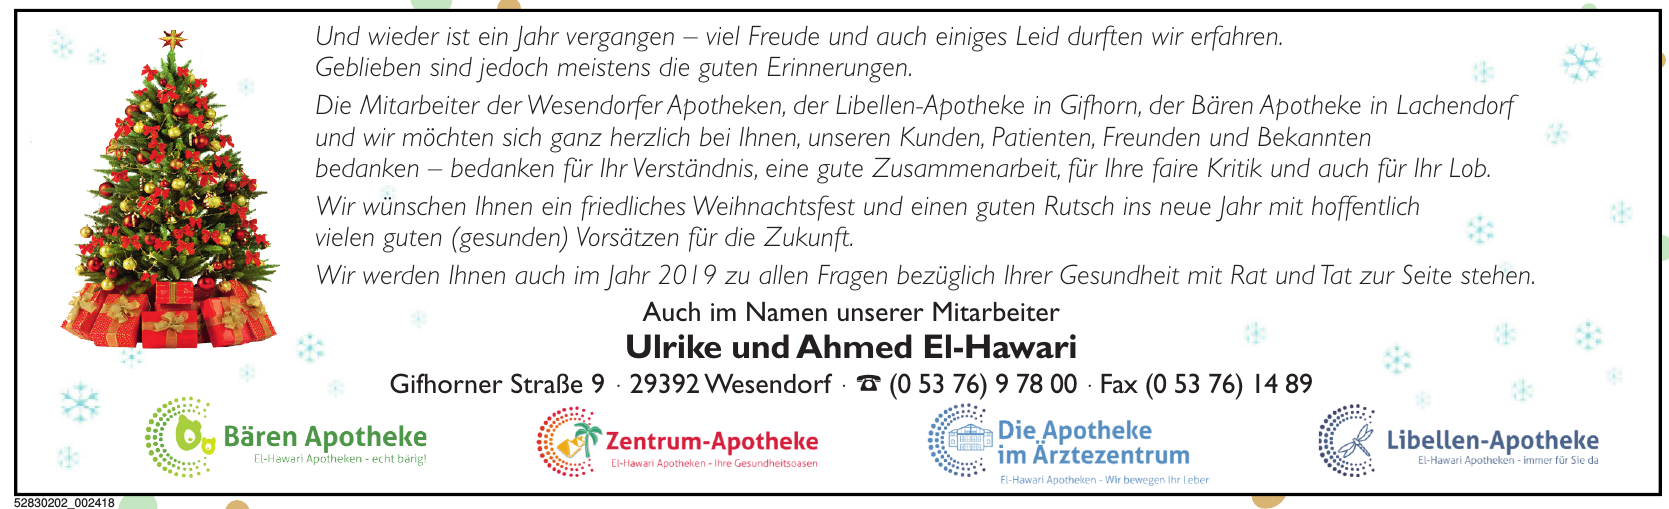 Ulrike und Ahmed El-Hawari